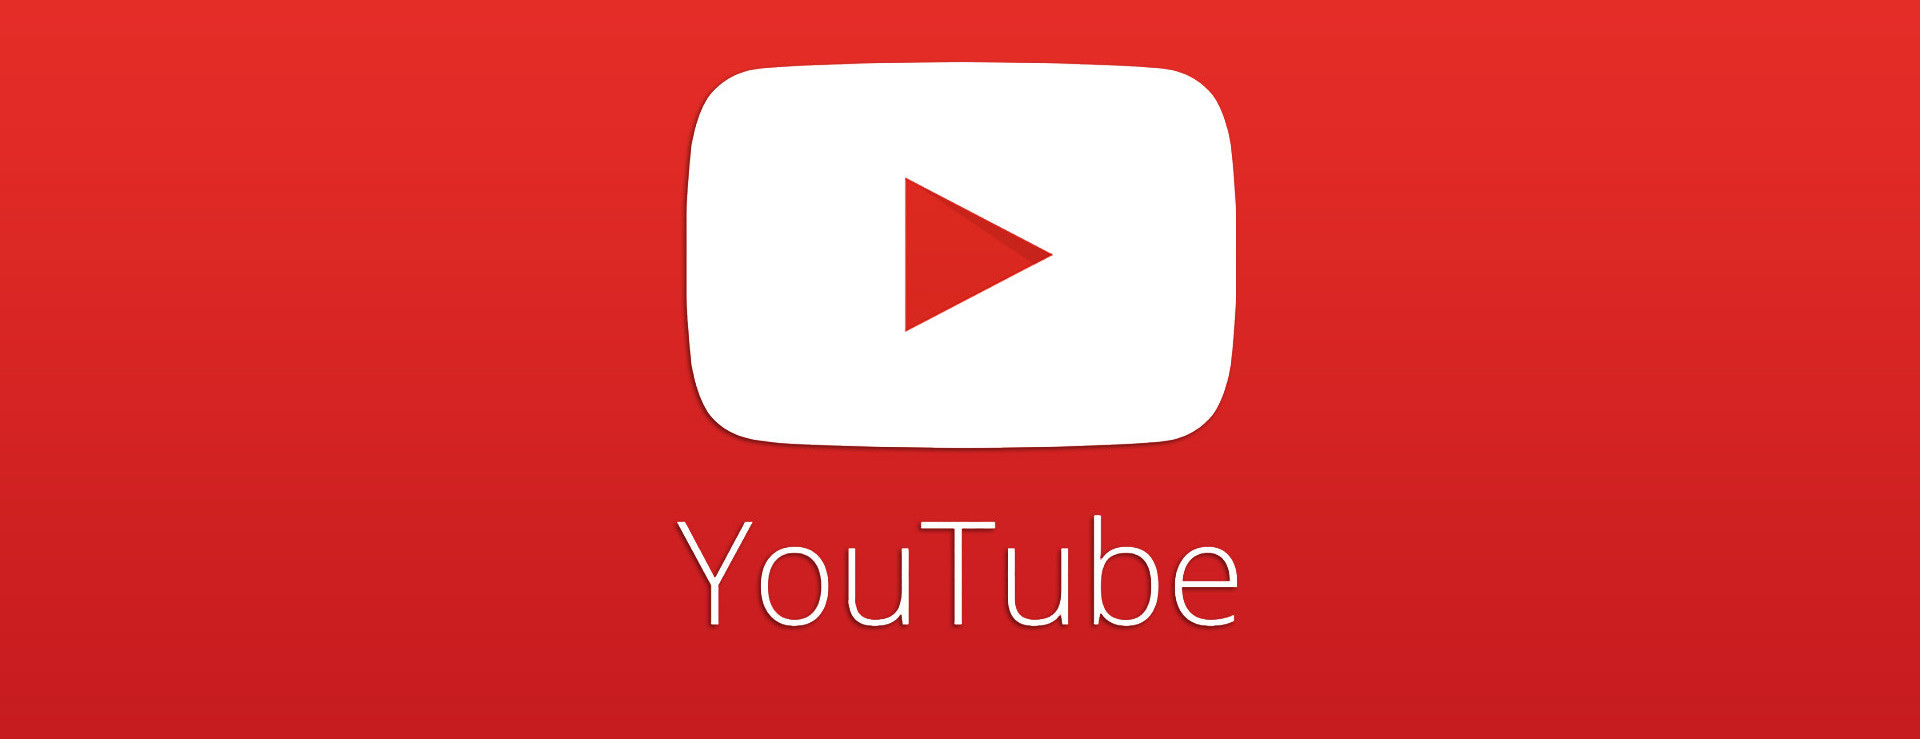 Uskoro stiže YouTube bez reklama